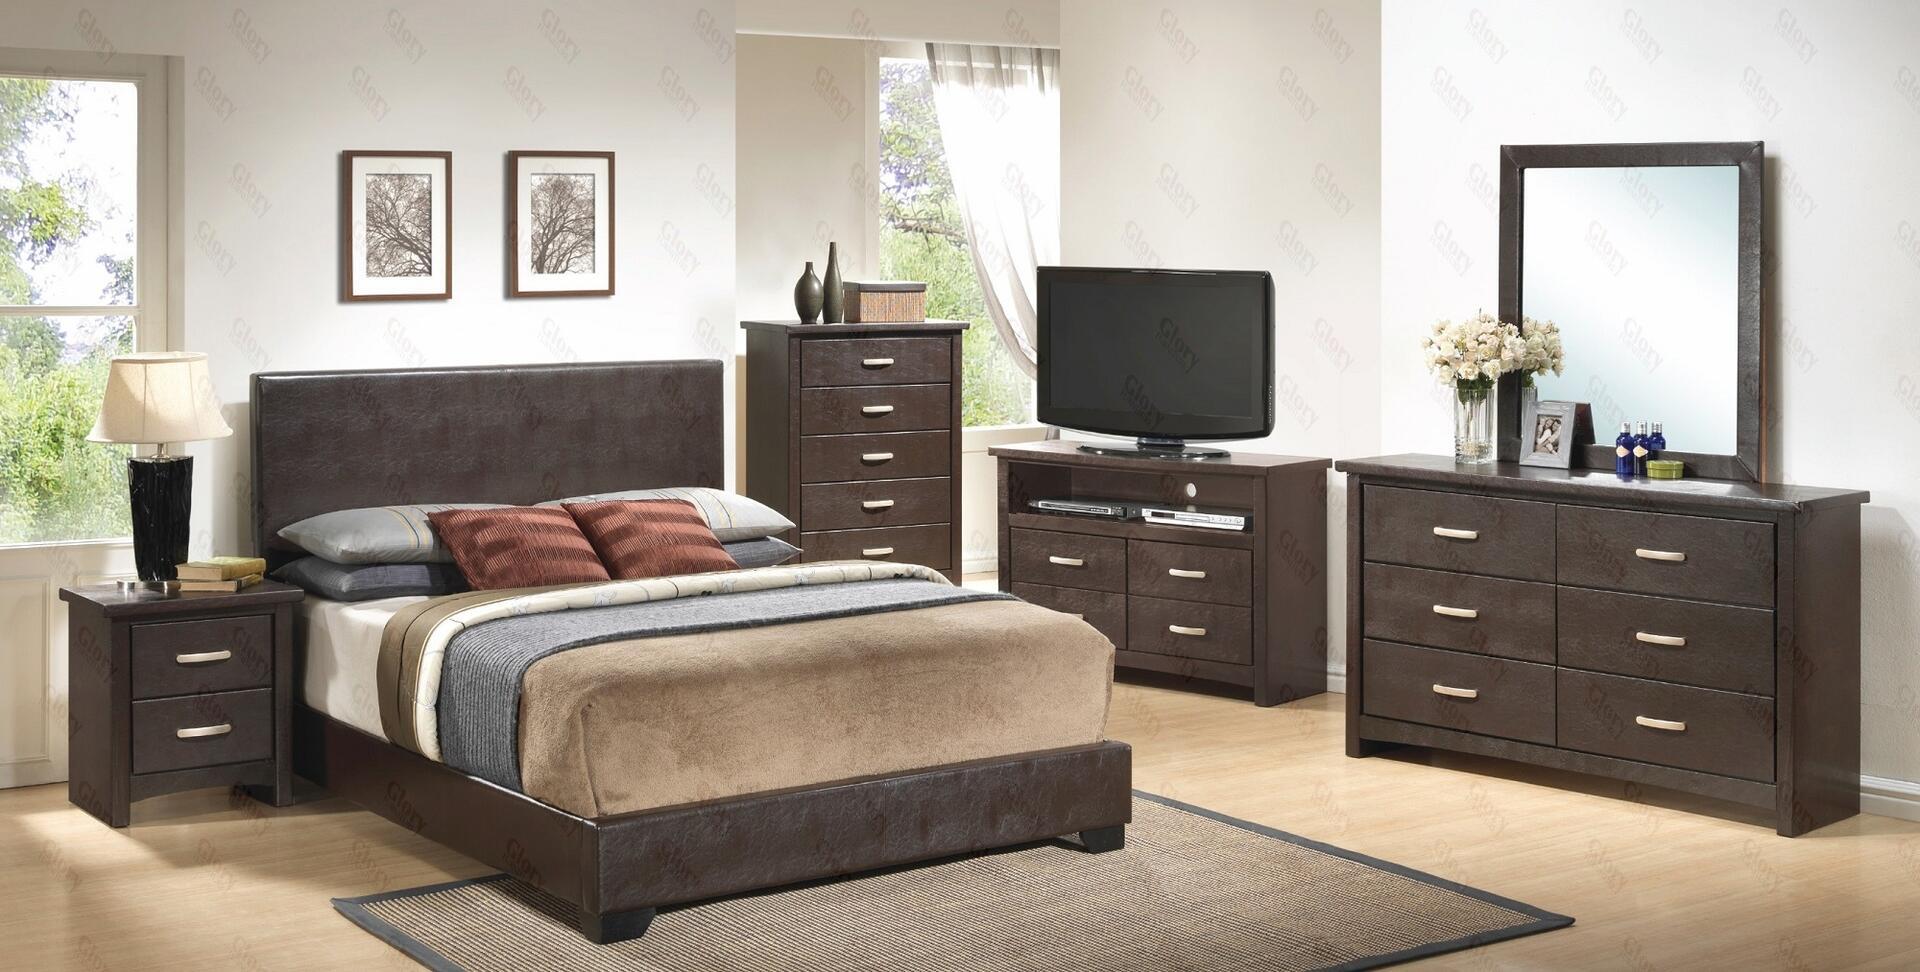 Glory Furniture G1800qbupset Queen Bedroom Sets